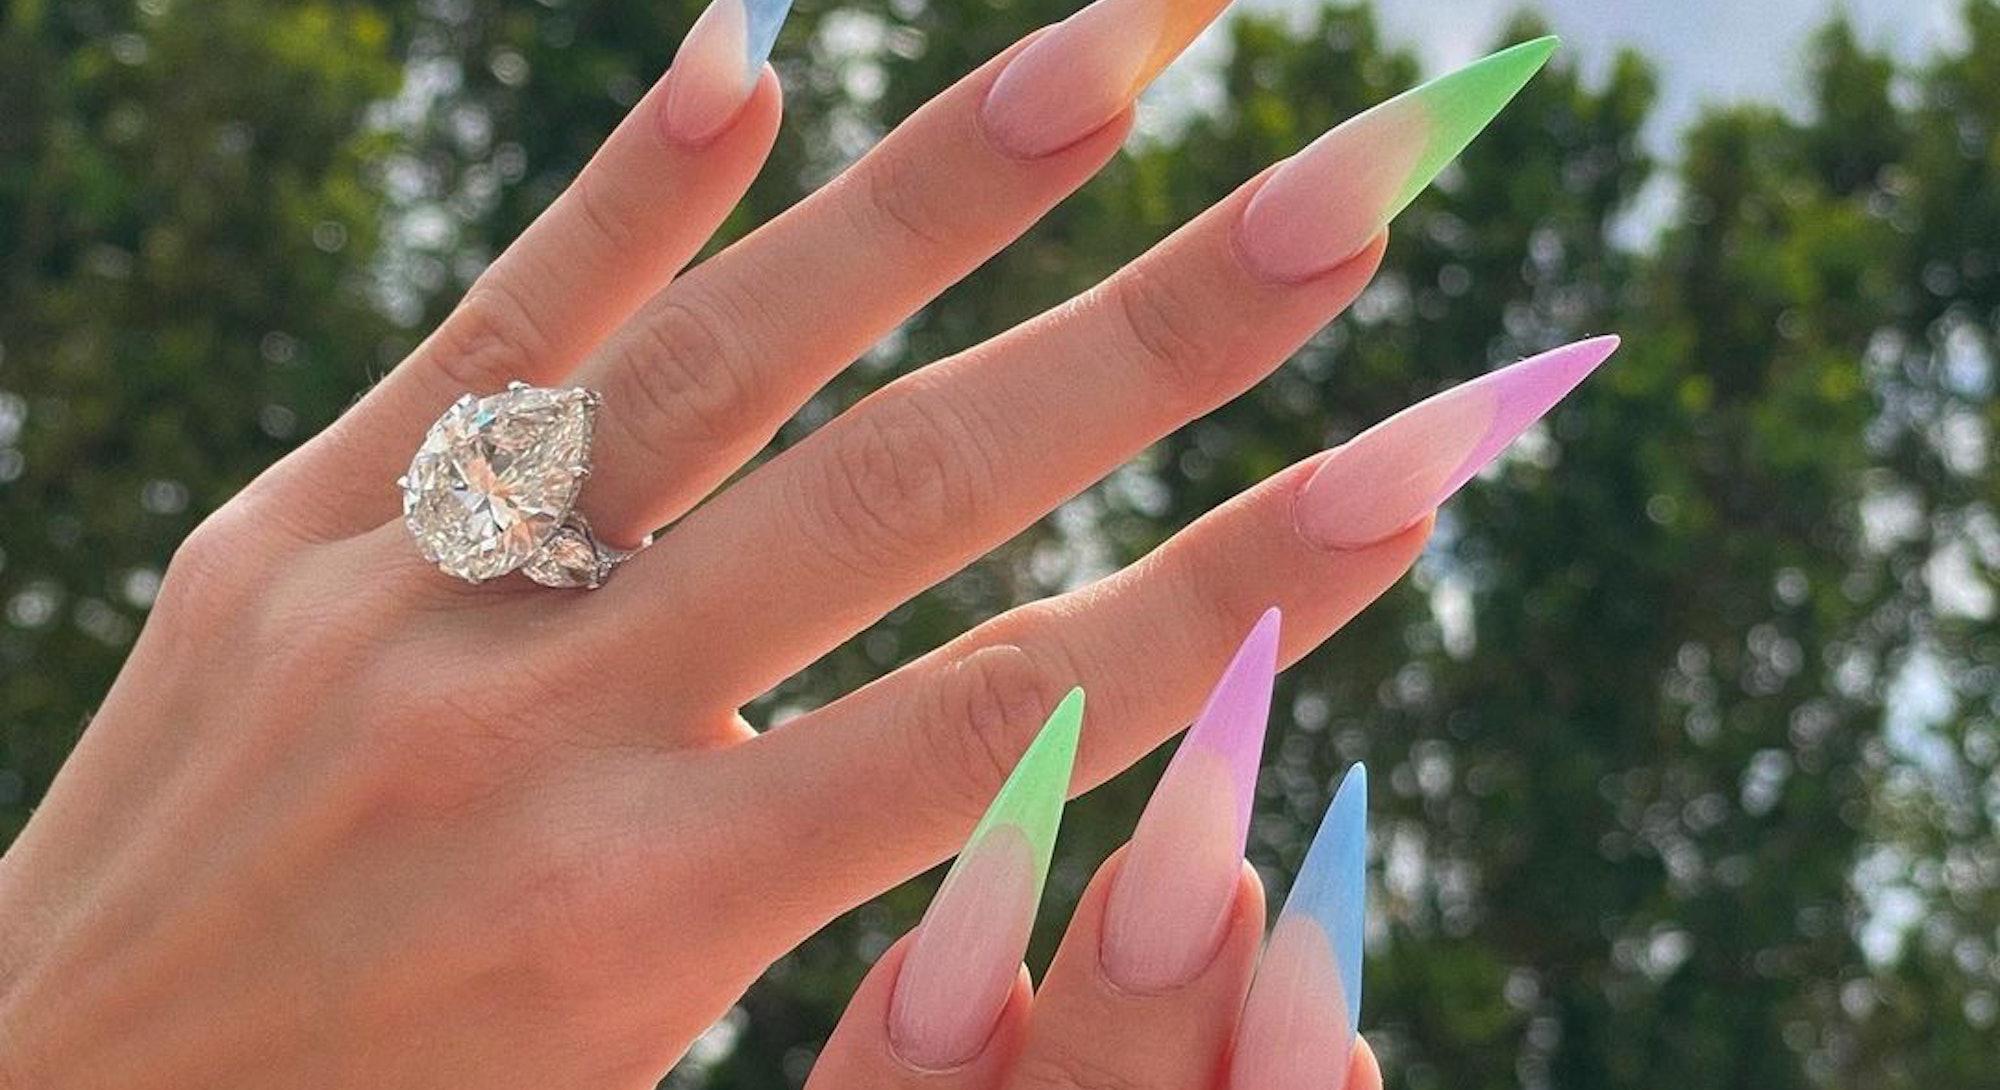 Khloé Kardashian on IG